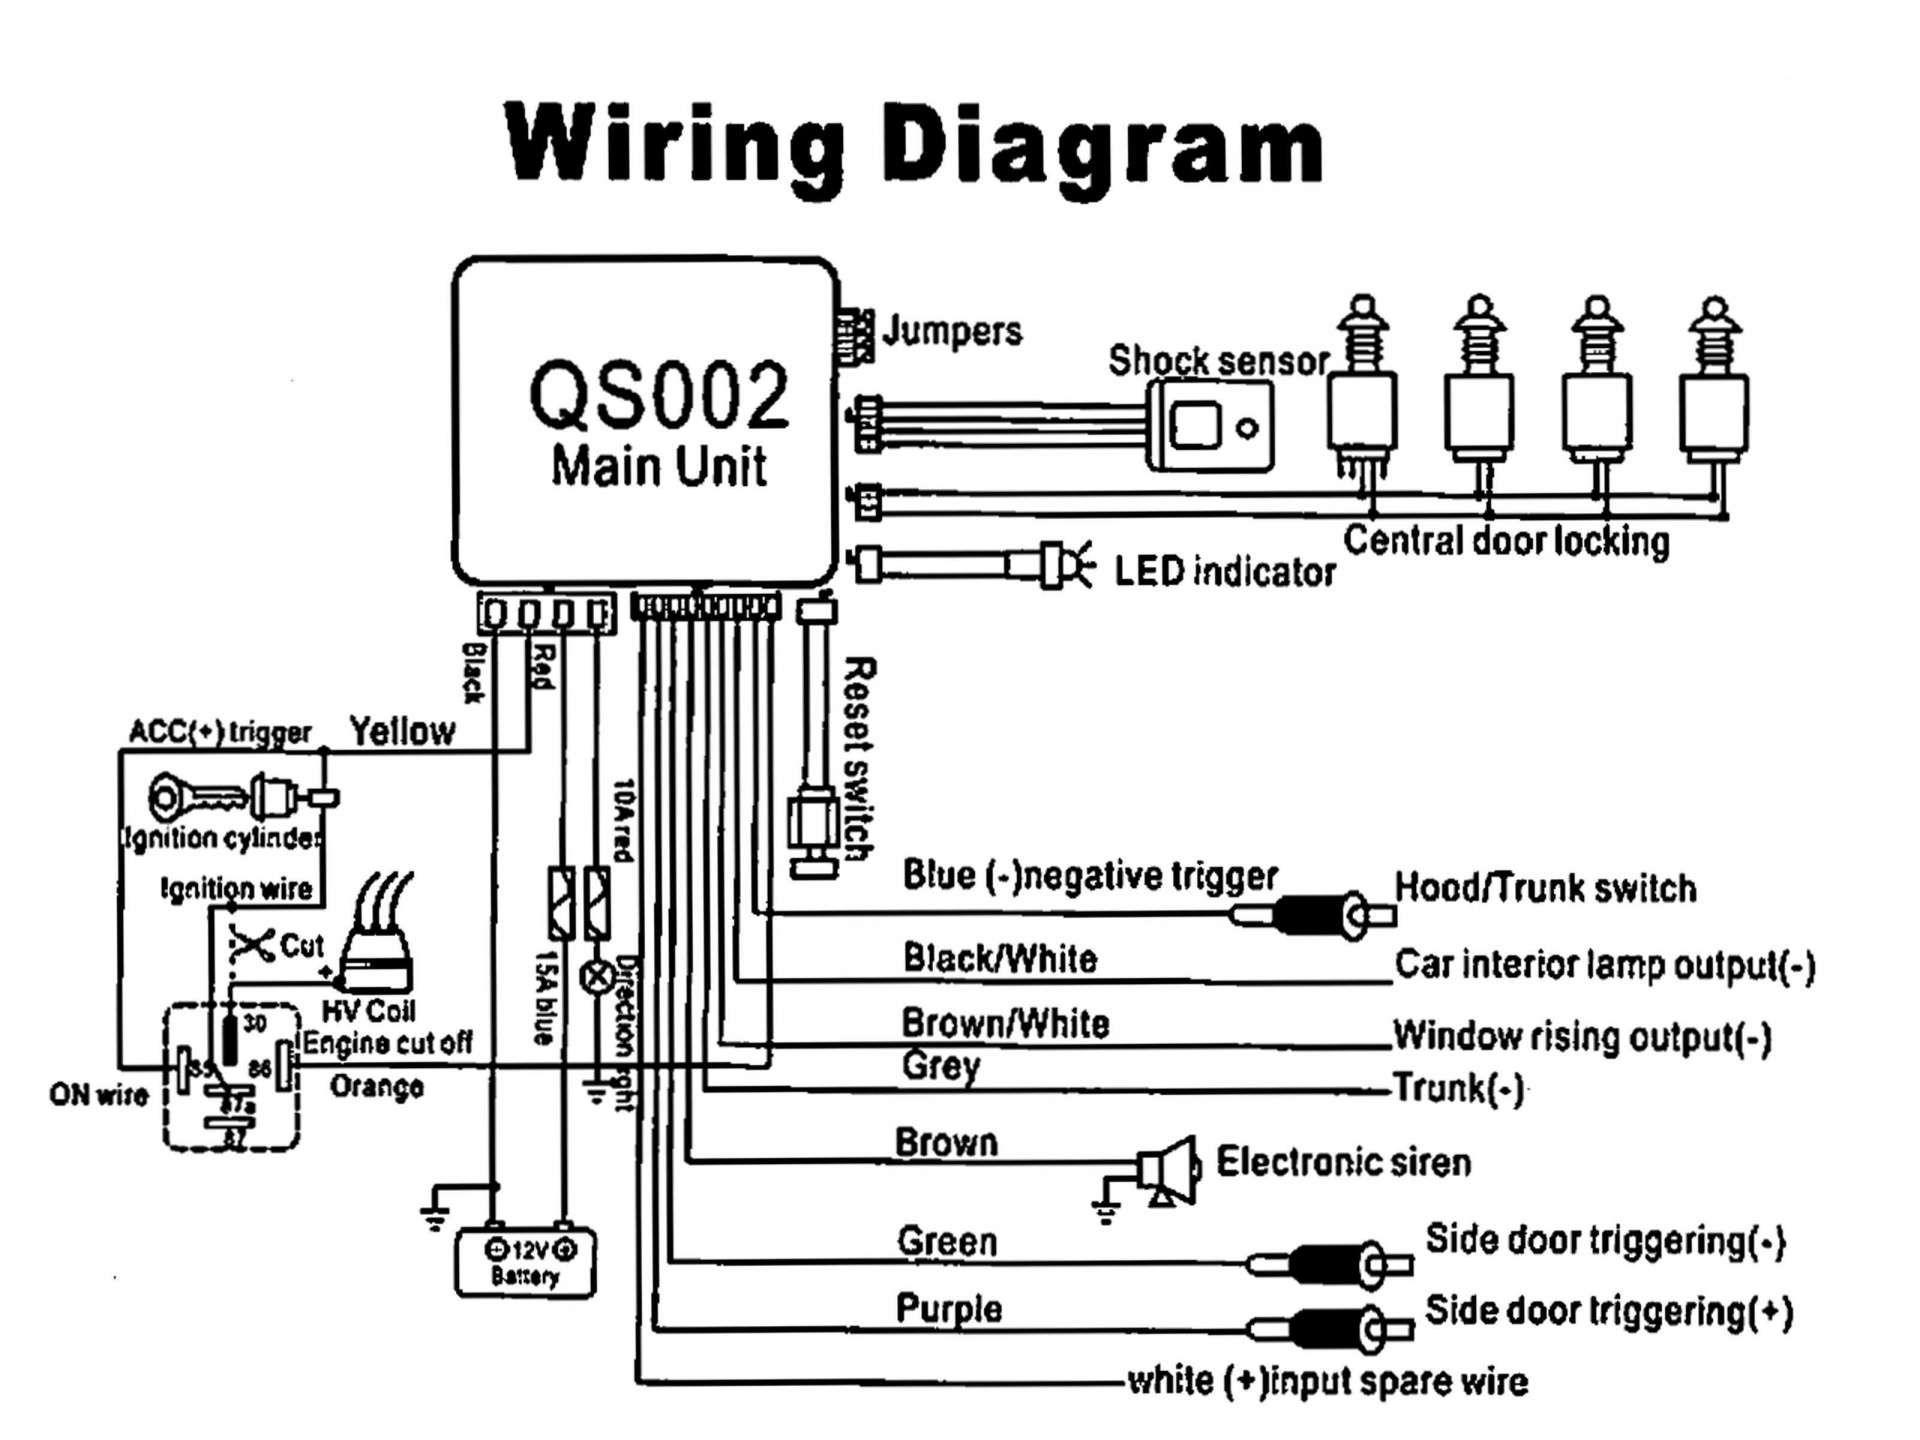 Manuals] 92 Chevy 1500 Wiring Diagram Starter.pdf FULL Version HD Quality Diagram  Starter.pdf - EGUIDEMANUALNET.PREVATO.ITPrevato.it